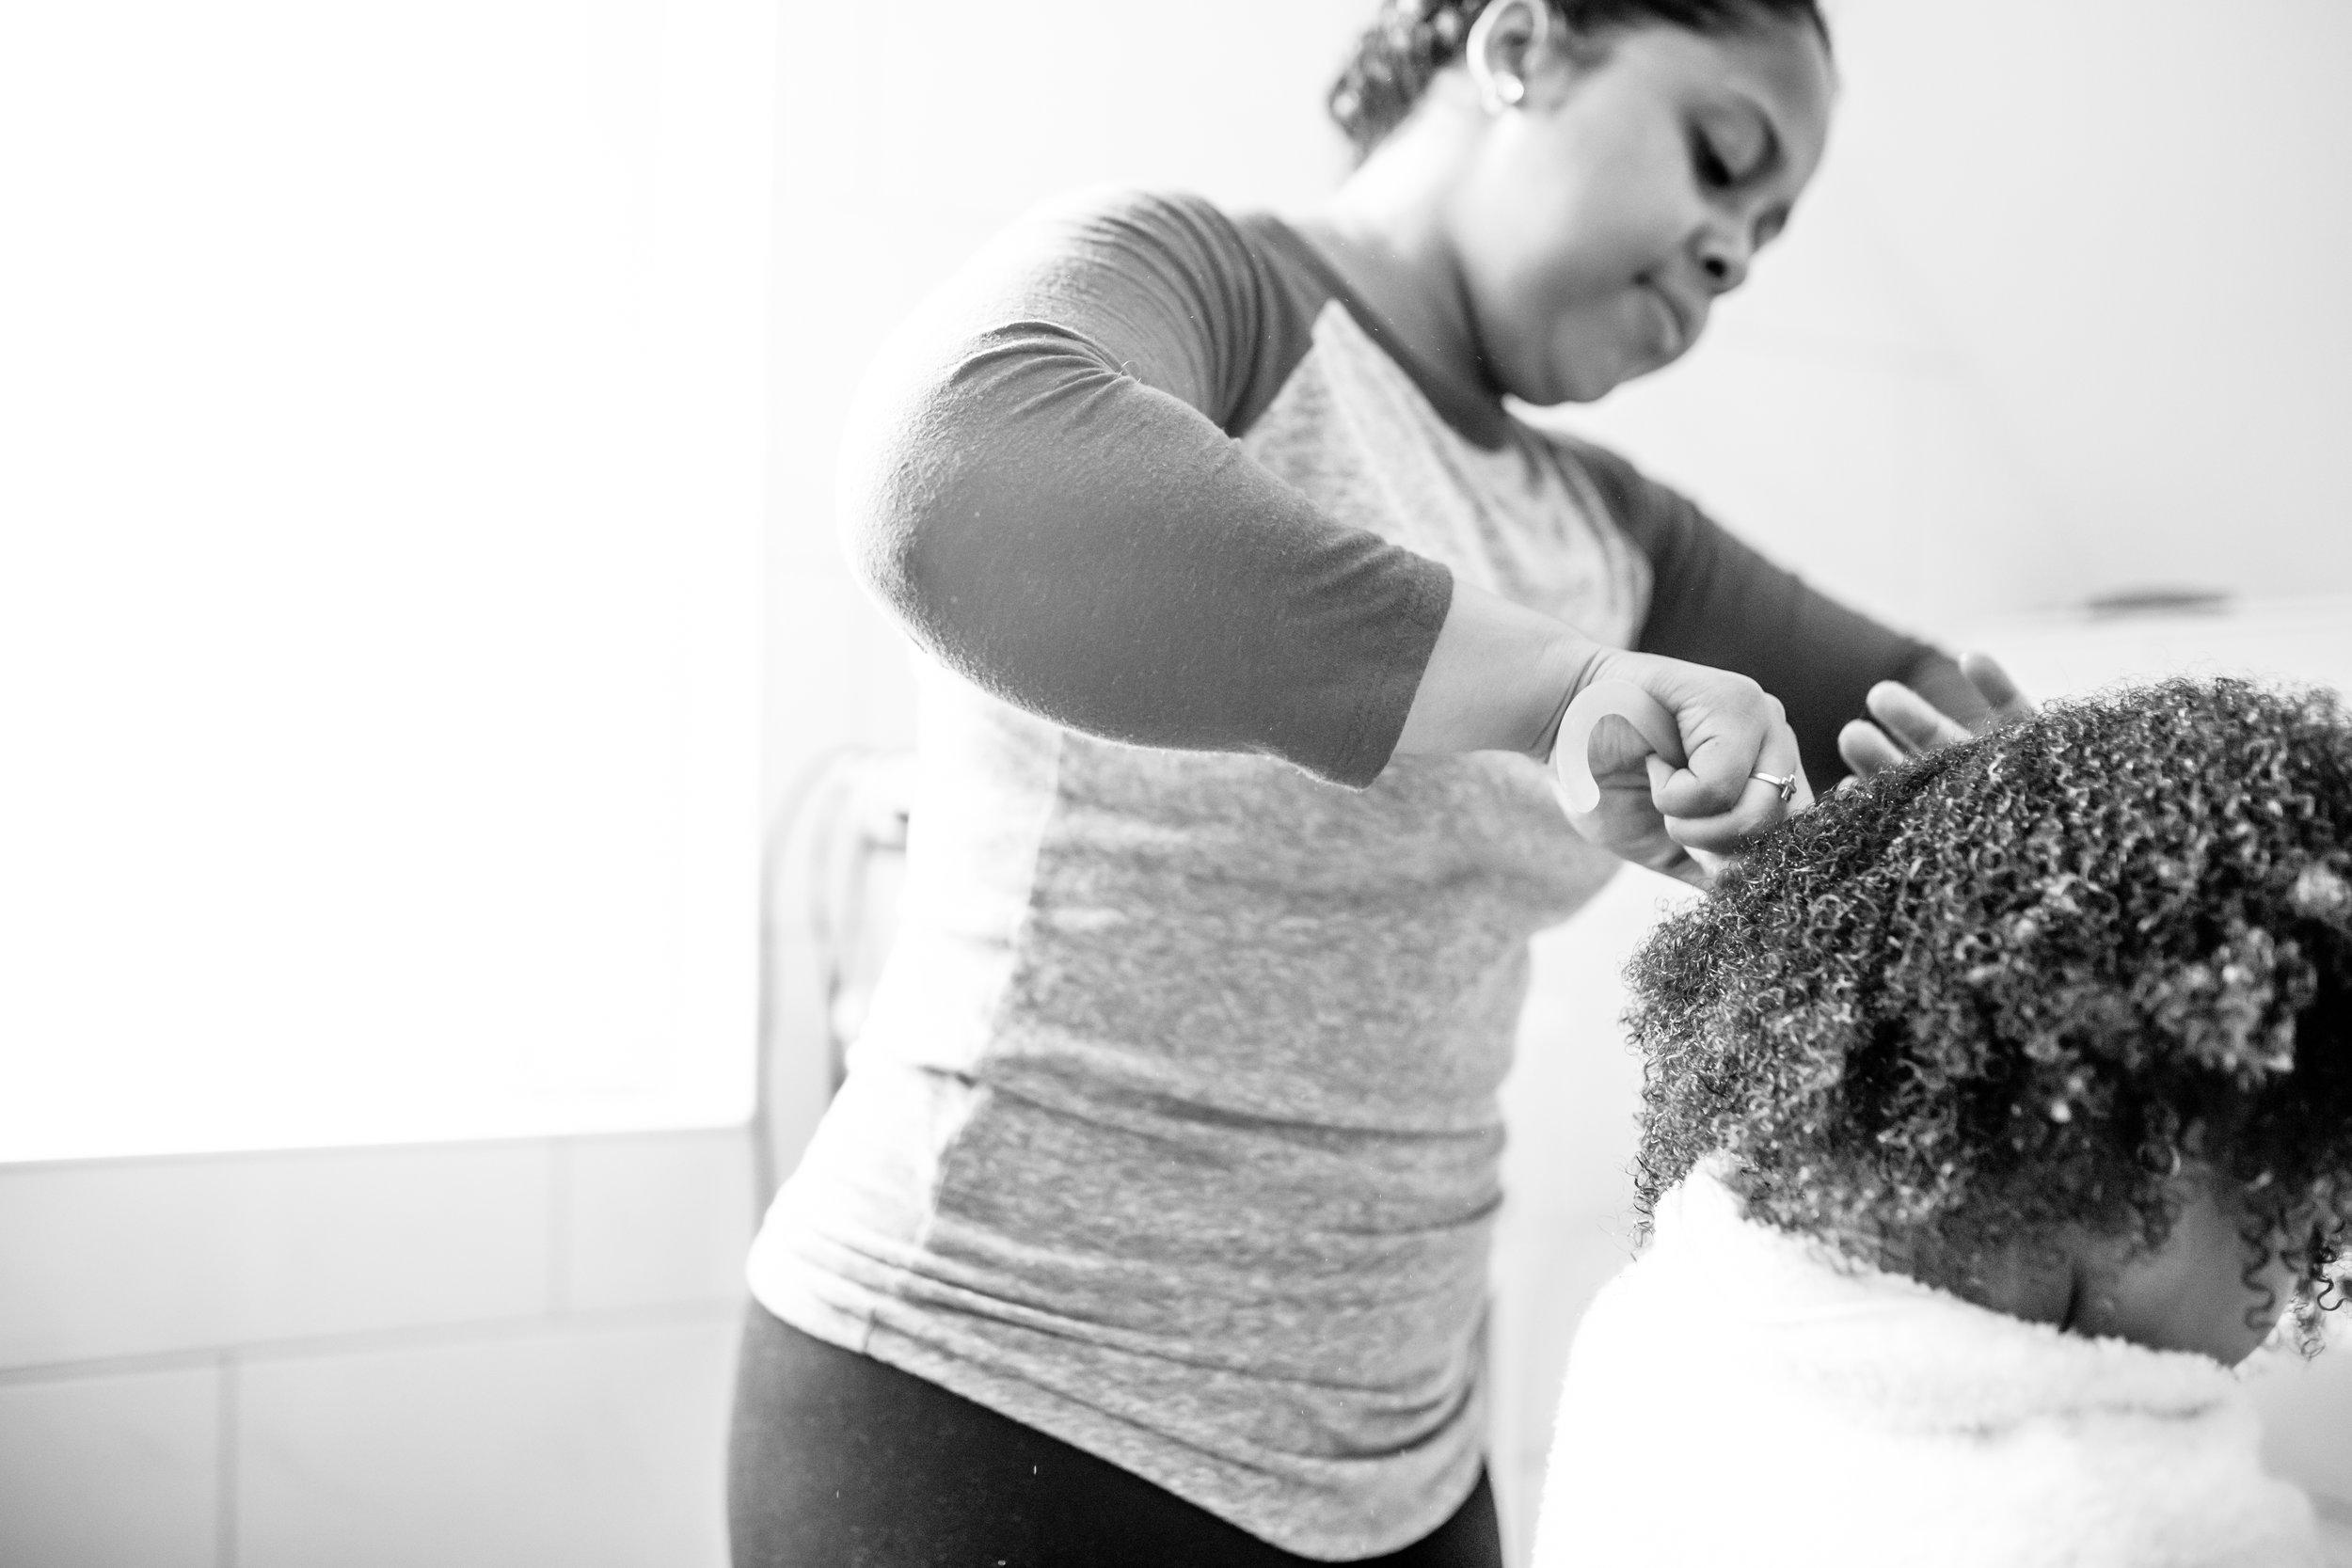 Mom brushes daughter's hair